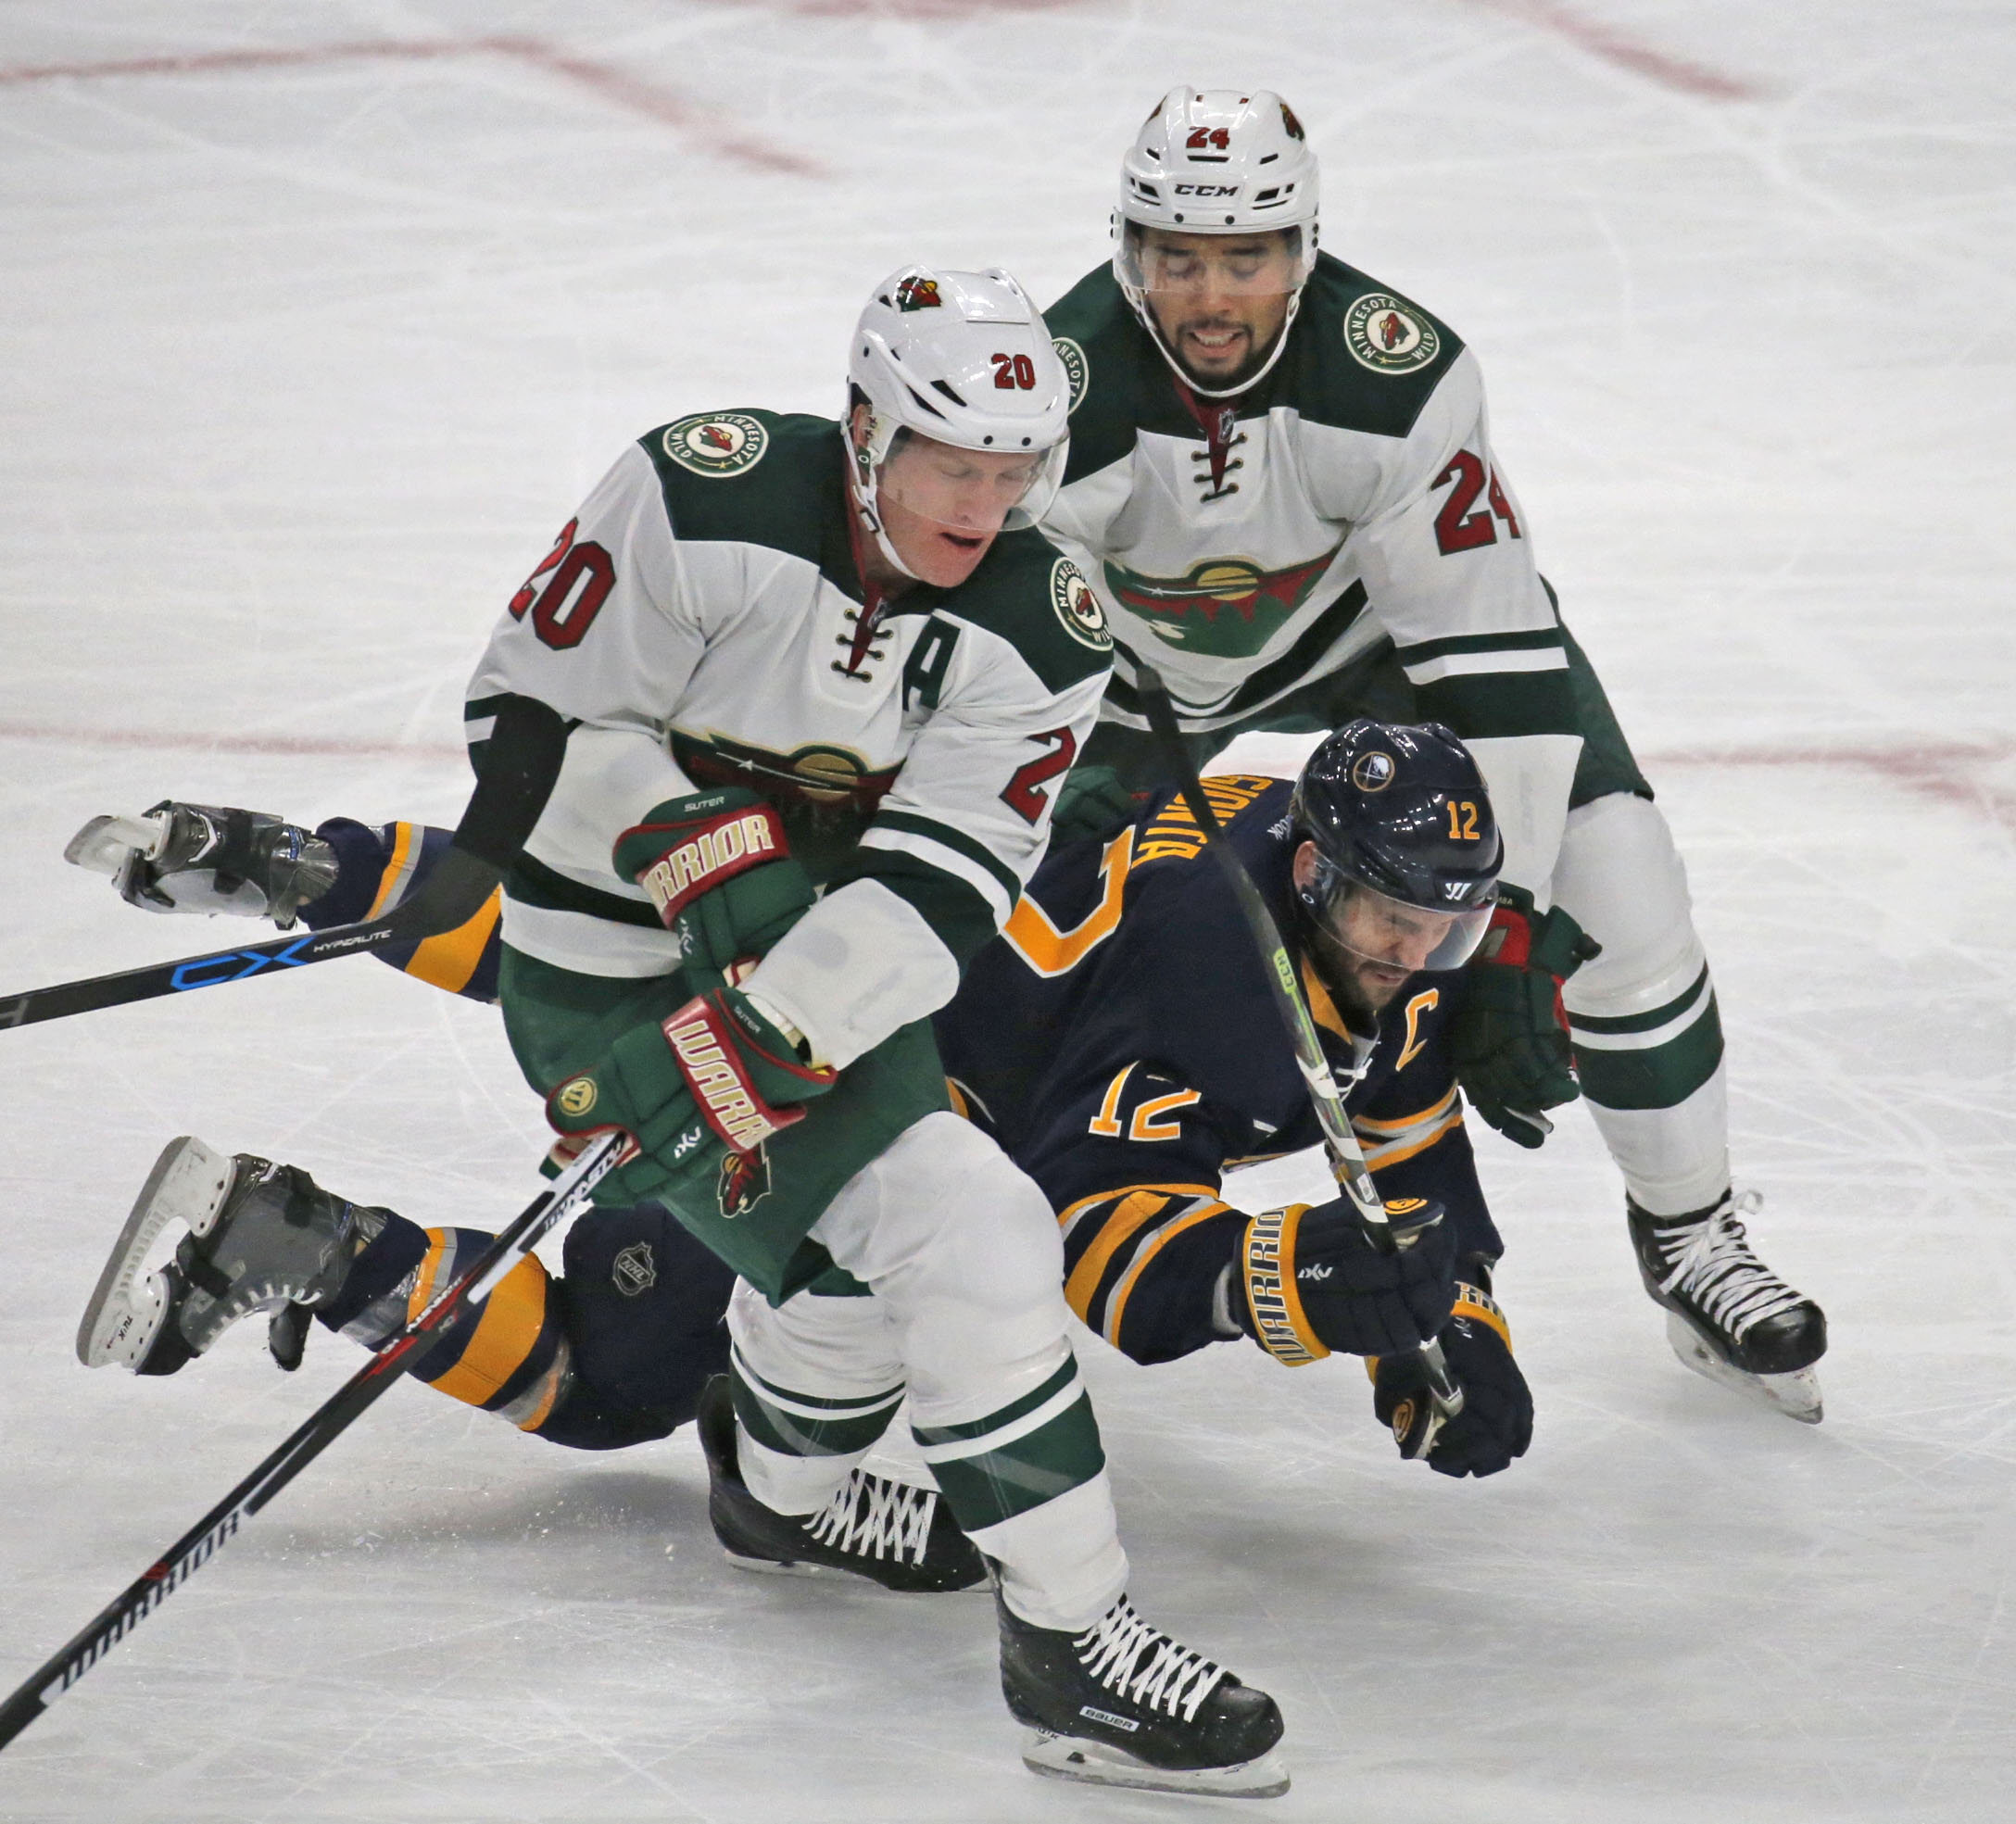 Buffalo's Brian Gionta (12) gets sandwiched by Minnesota defensemen Ryan Suter (20) and Matt Dumba (24) (Robert Kirkham/Buffalo News).